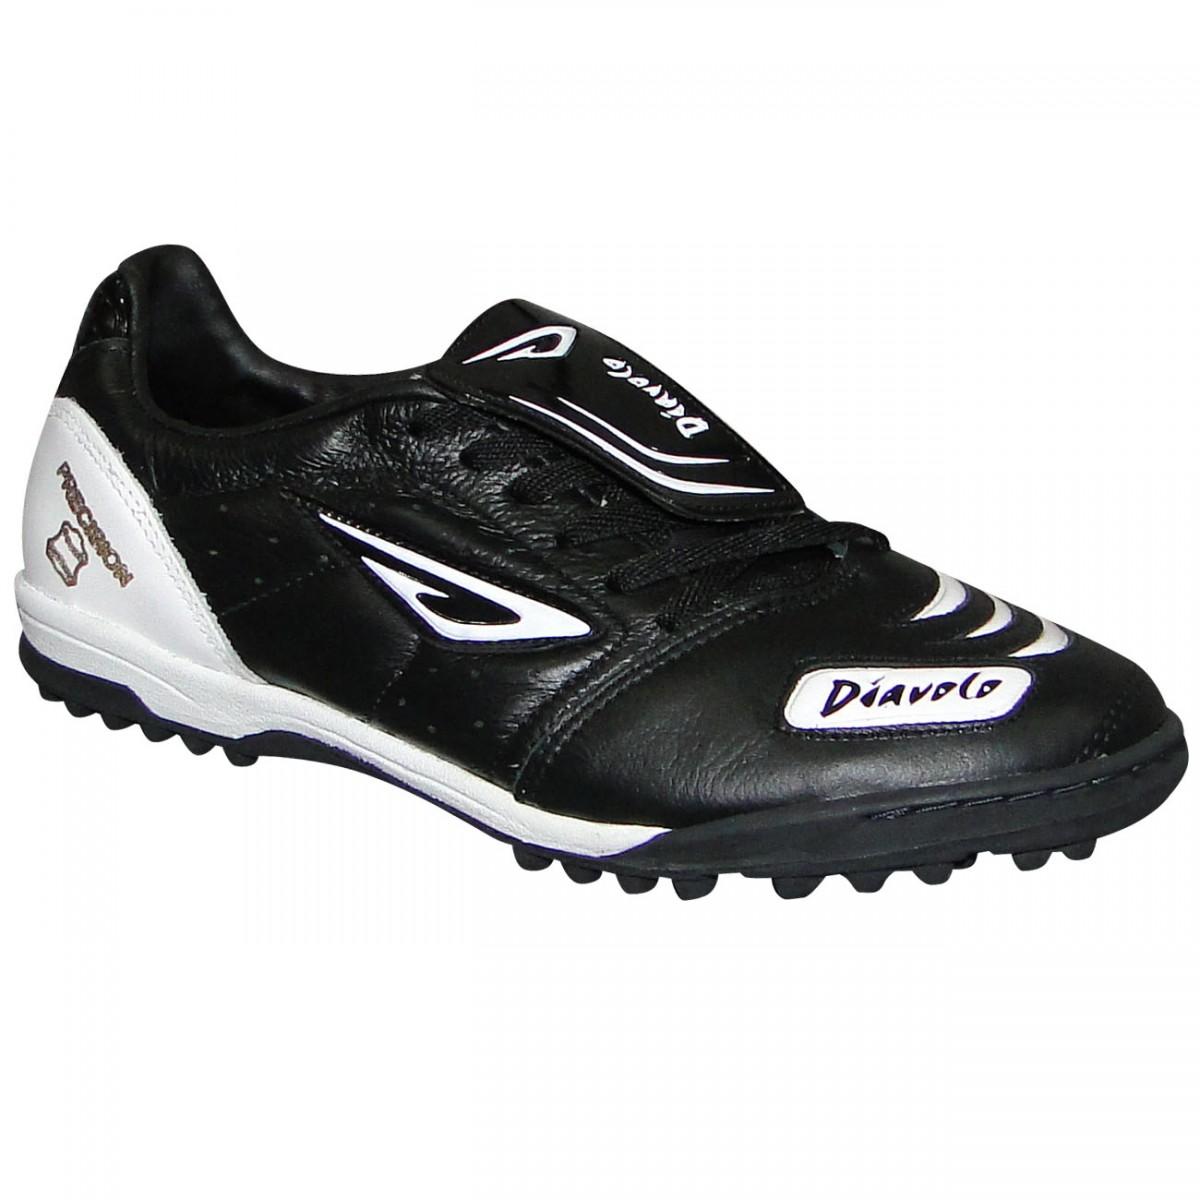 Chuteira Society Diavolo Precision HG 9164 - Preto Branco - Chuteira Nike 016ffc9161a81